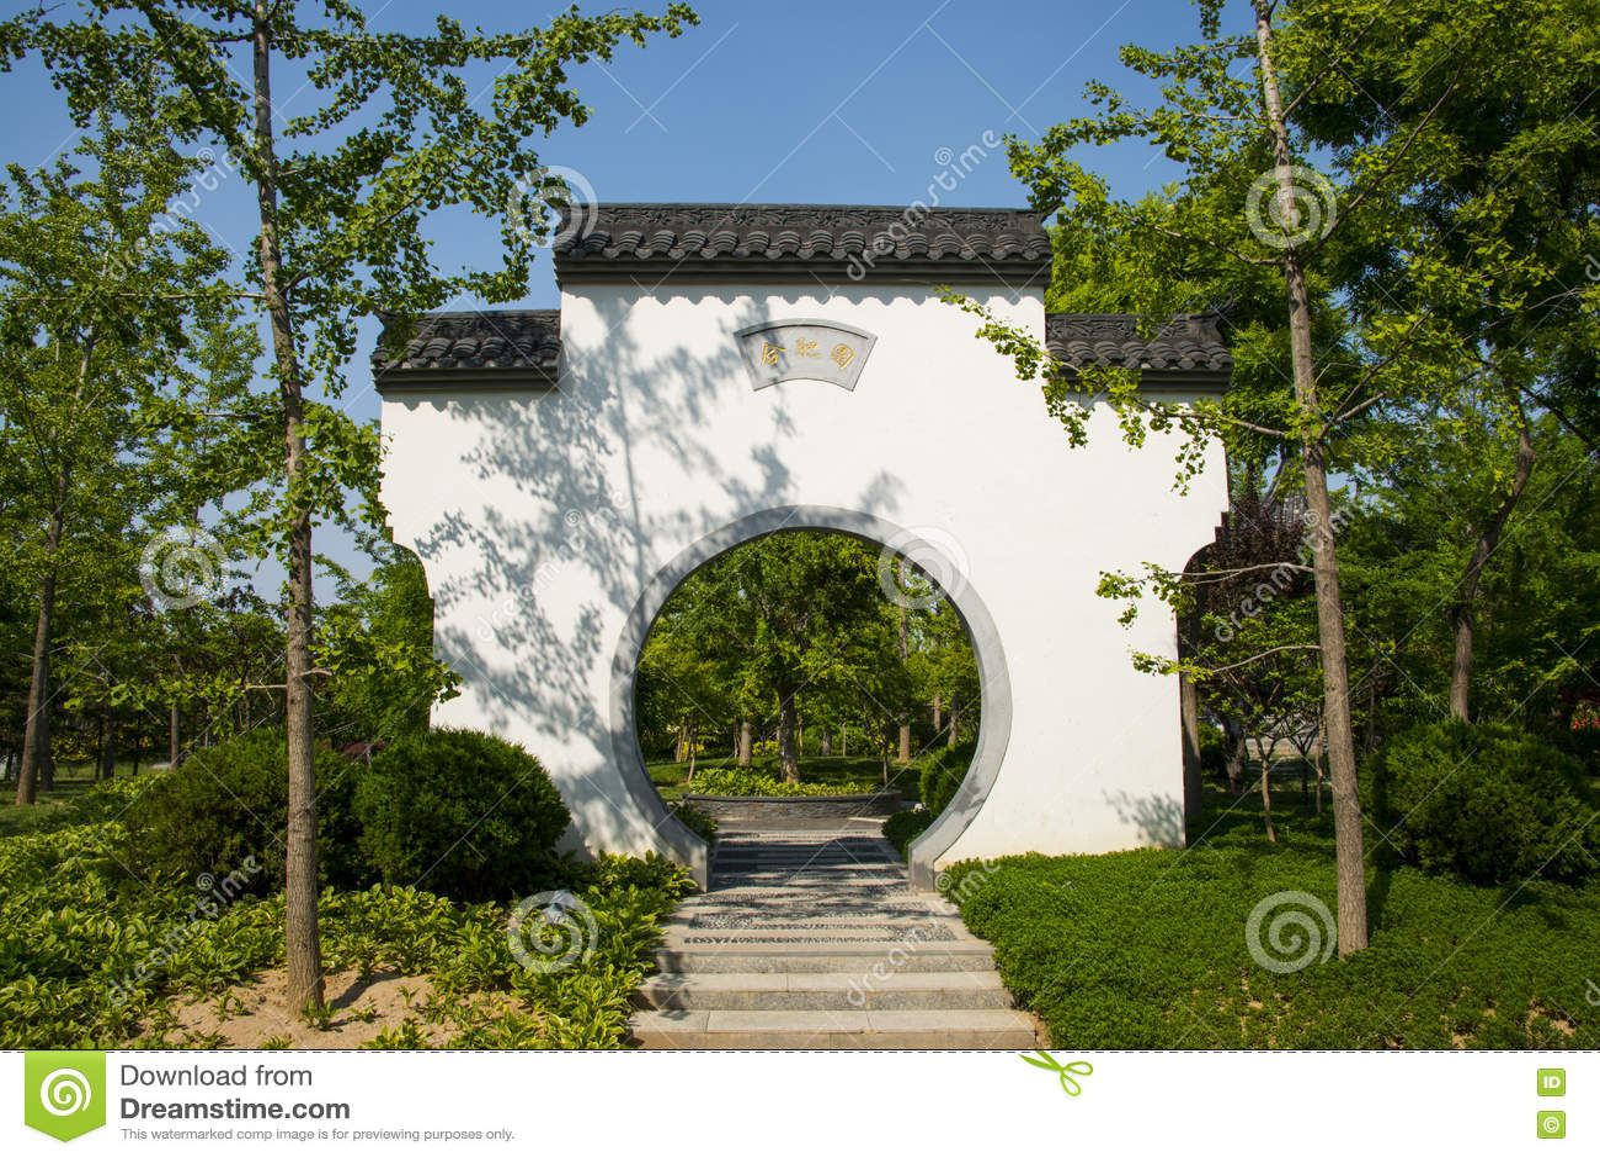 Grijze Tegels Tuin : Azië chinees peking tuin expo de tuinbouw de witte cirkeldeur